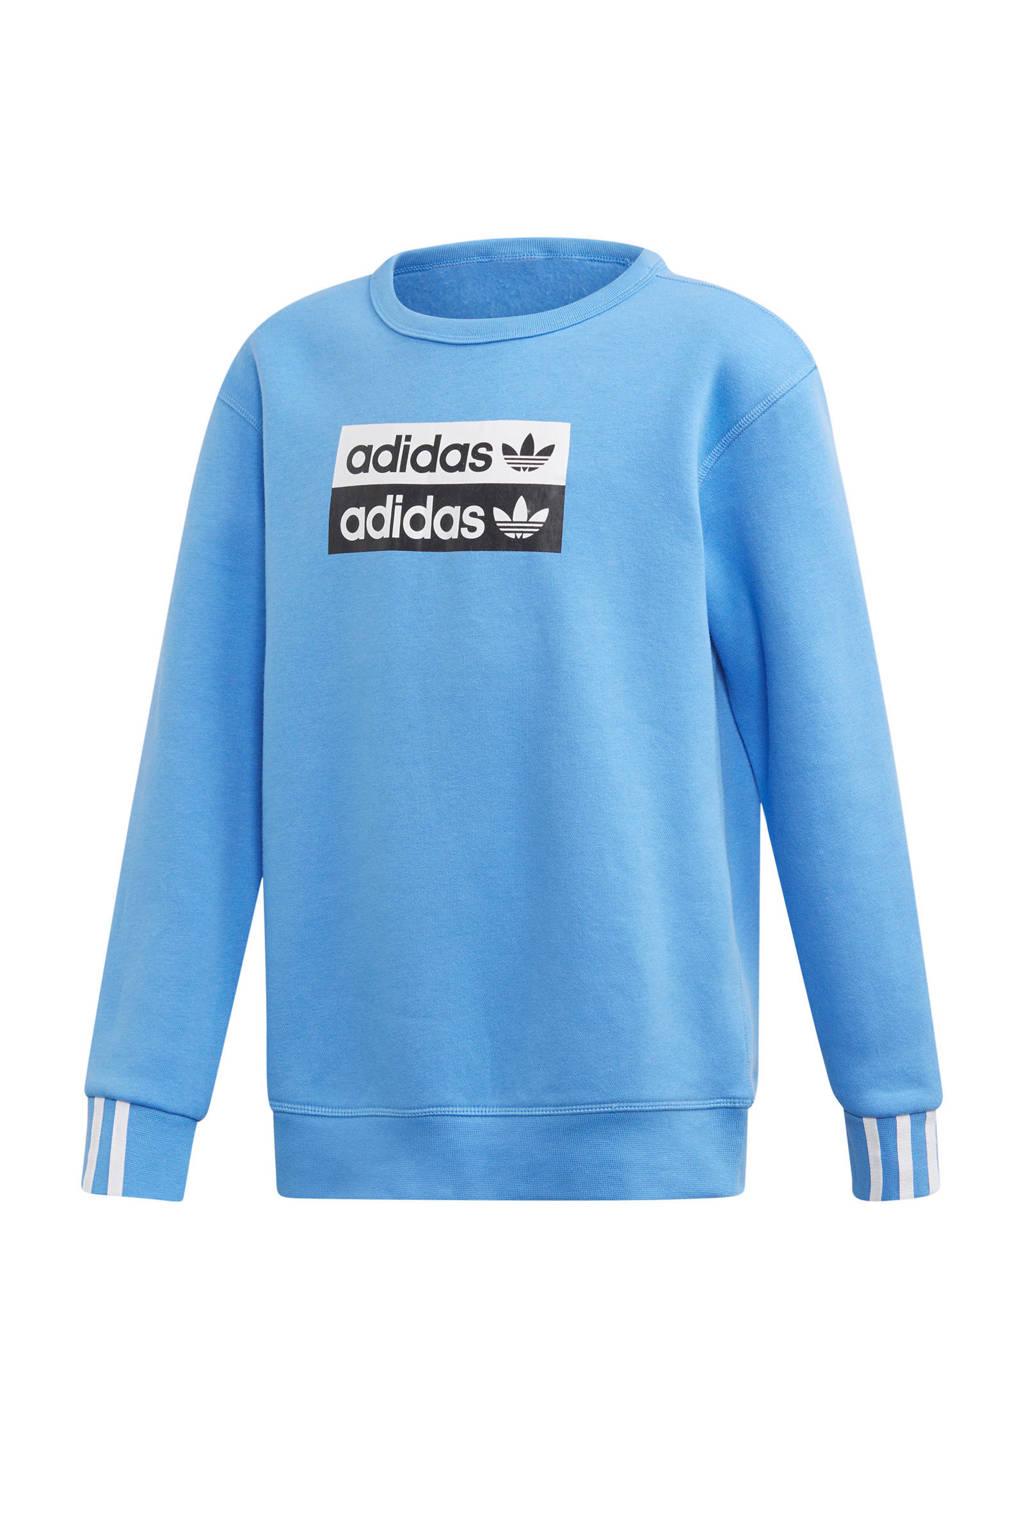 adidas originals   sweater blauw, Blauw